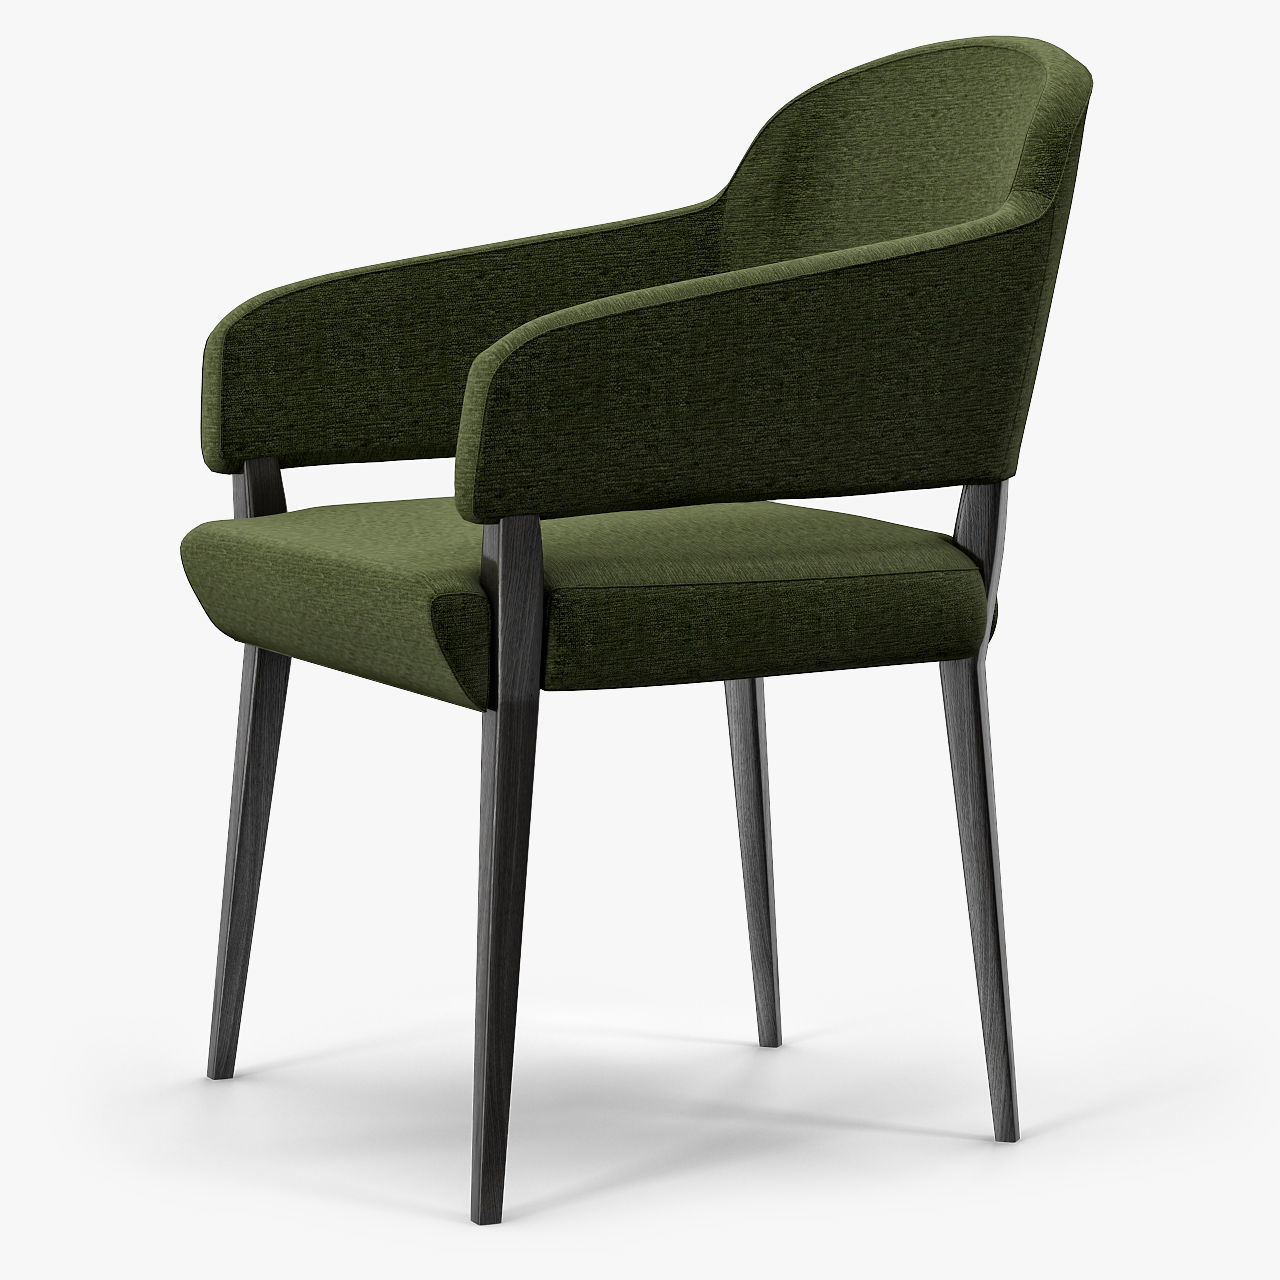 upright recliner chairs plastic dining nz knightsbridge lucia open chair 3d model max obj